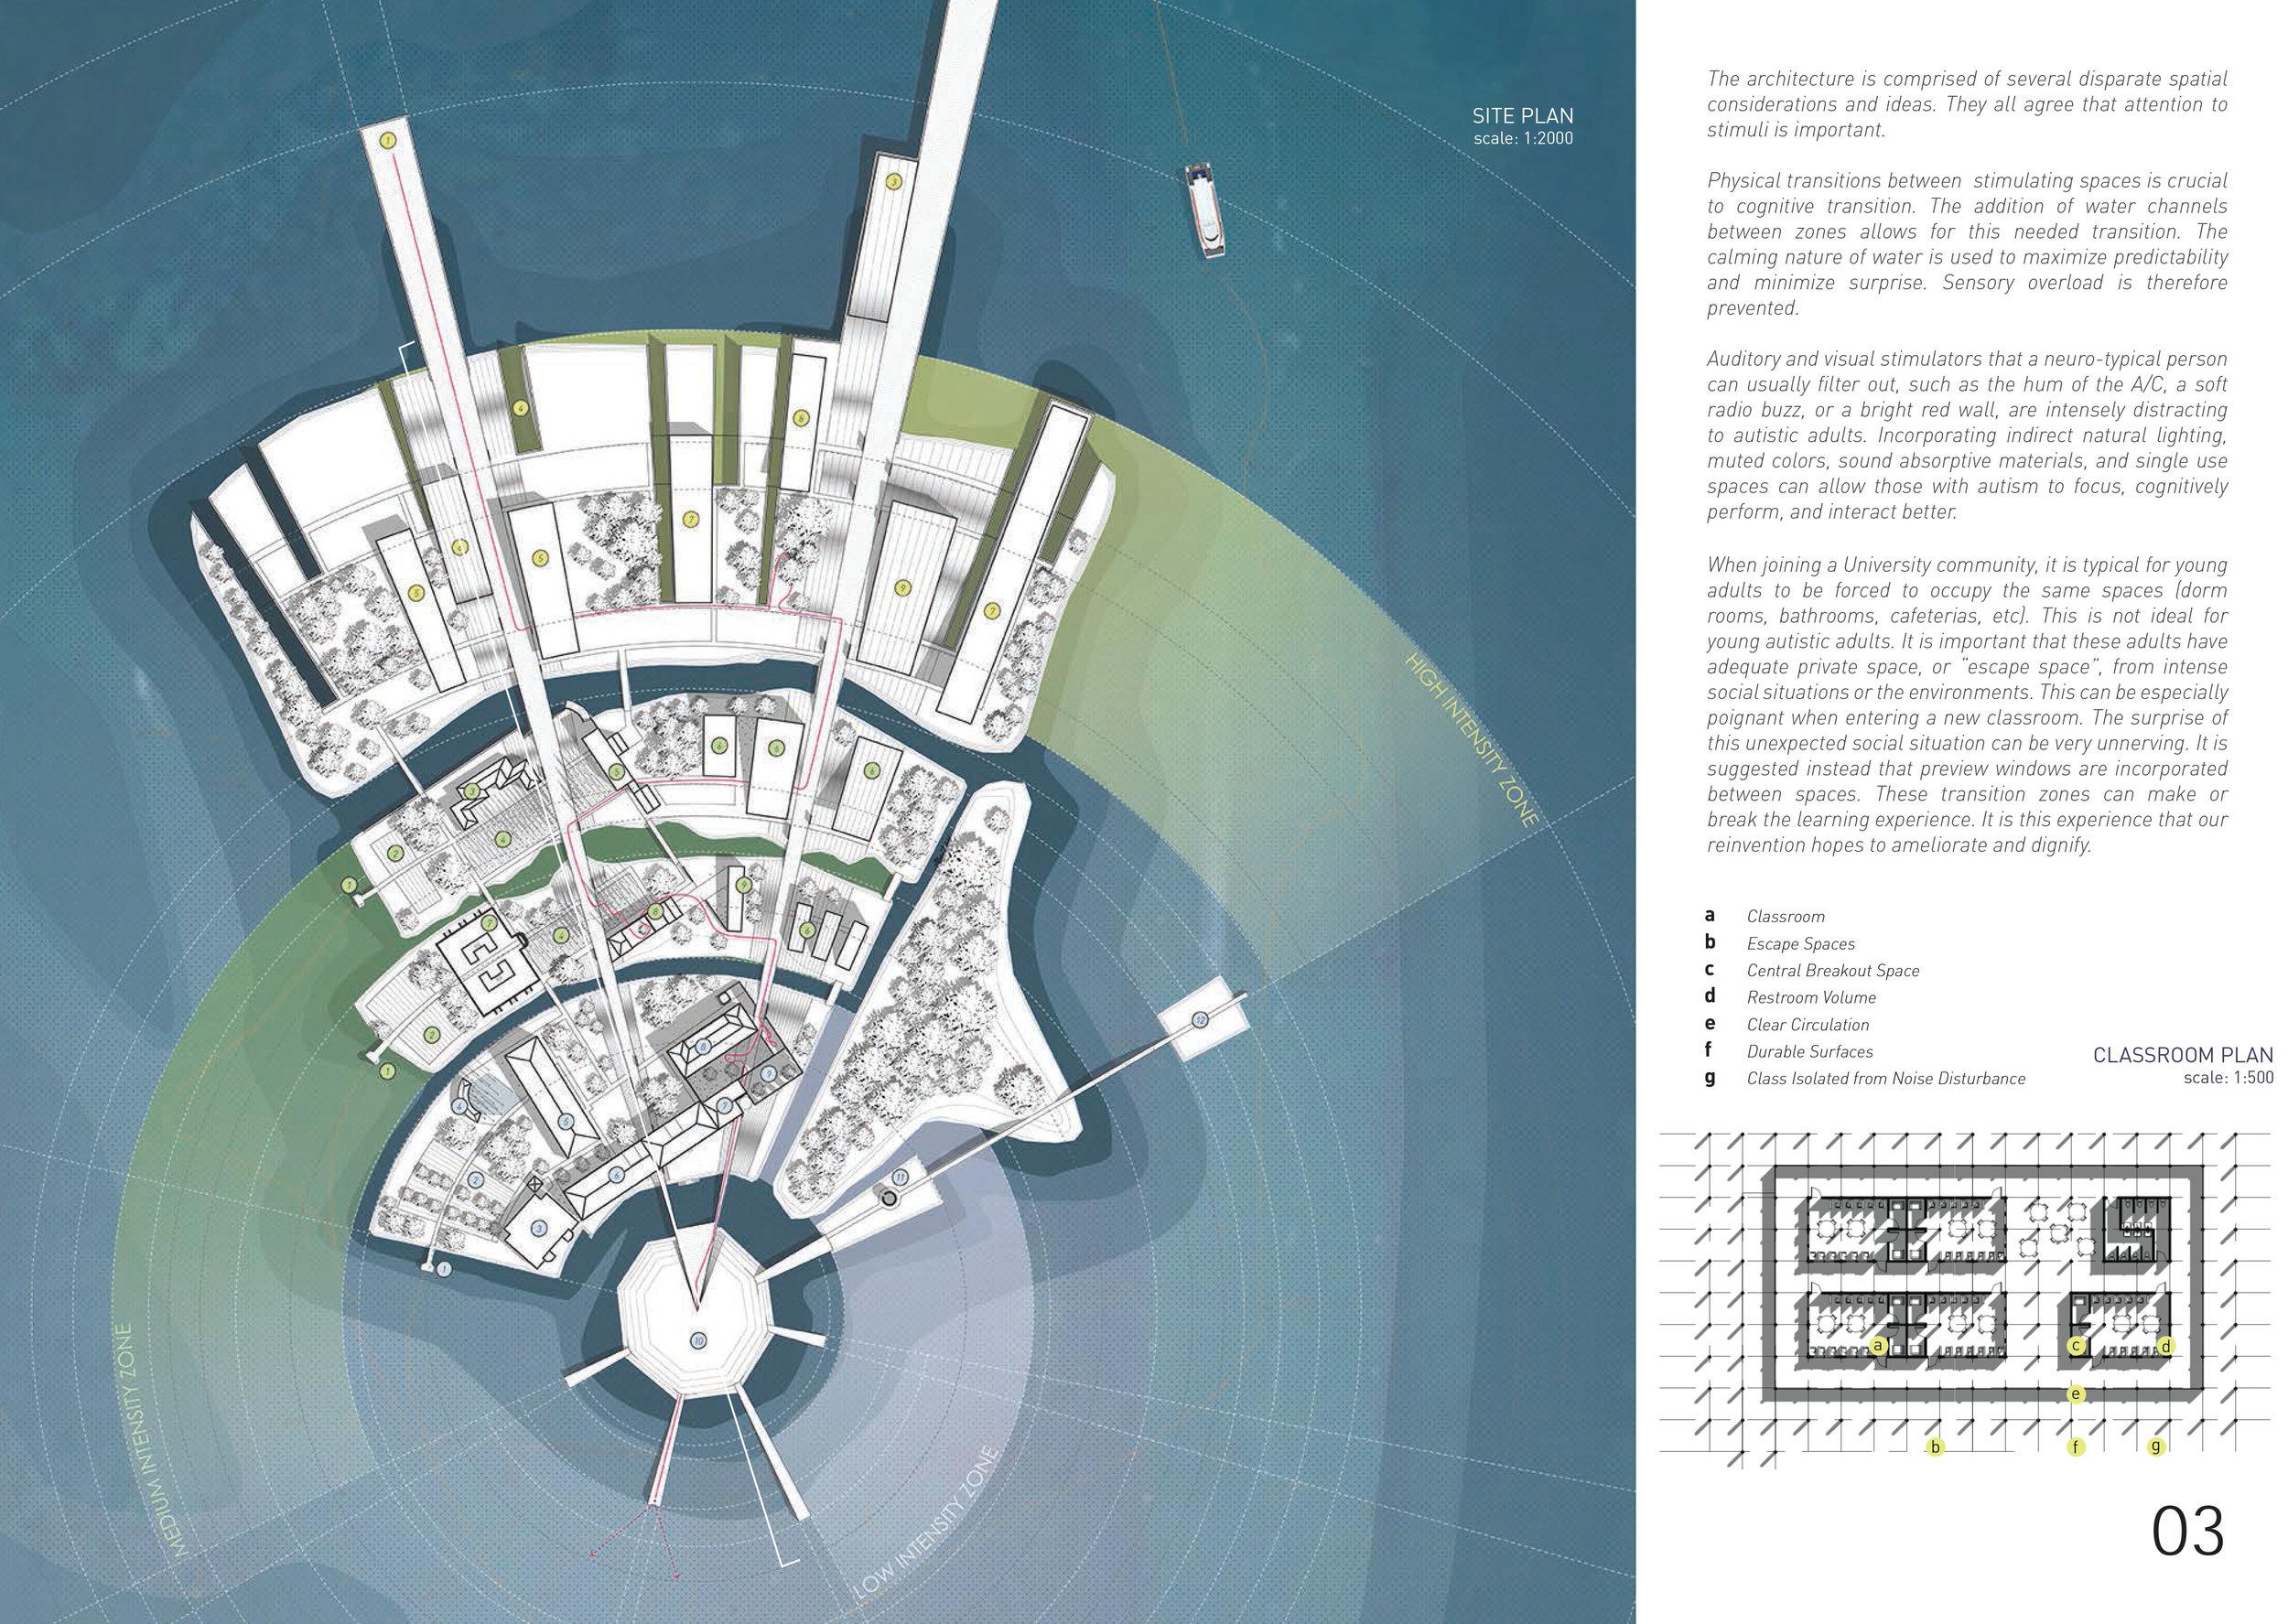 Univeristy Island Gradient Matt Fajkus Architecture MF MFx16_3.jpg